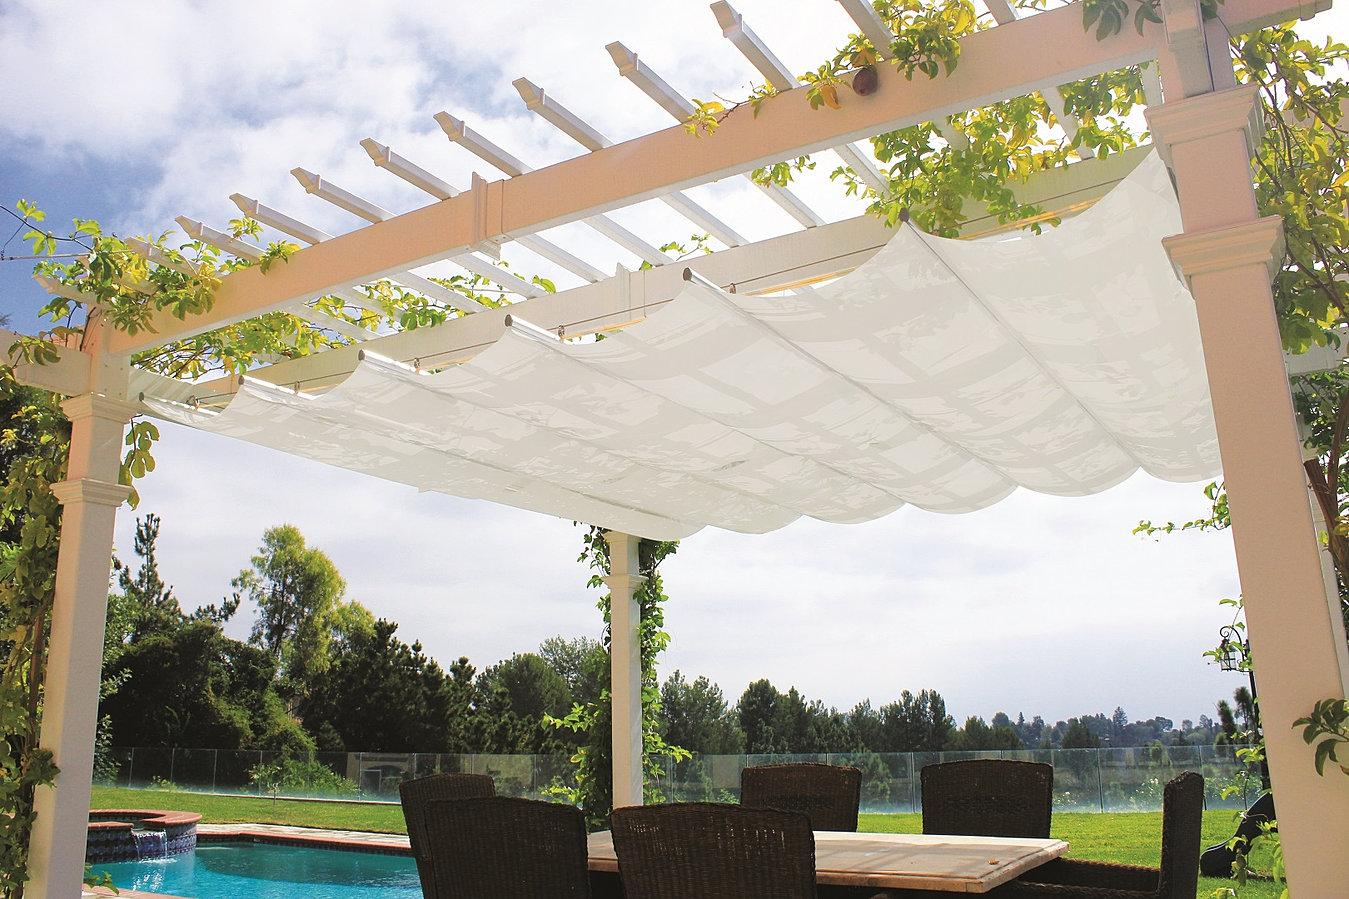 Retractable canopy for pergola - Modular Dynamic Versatile